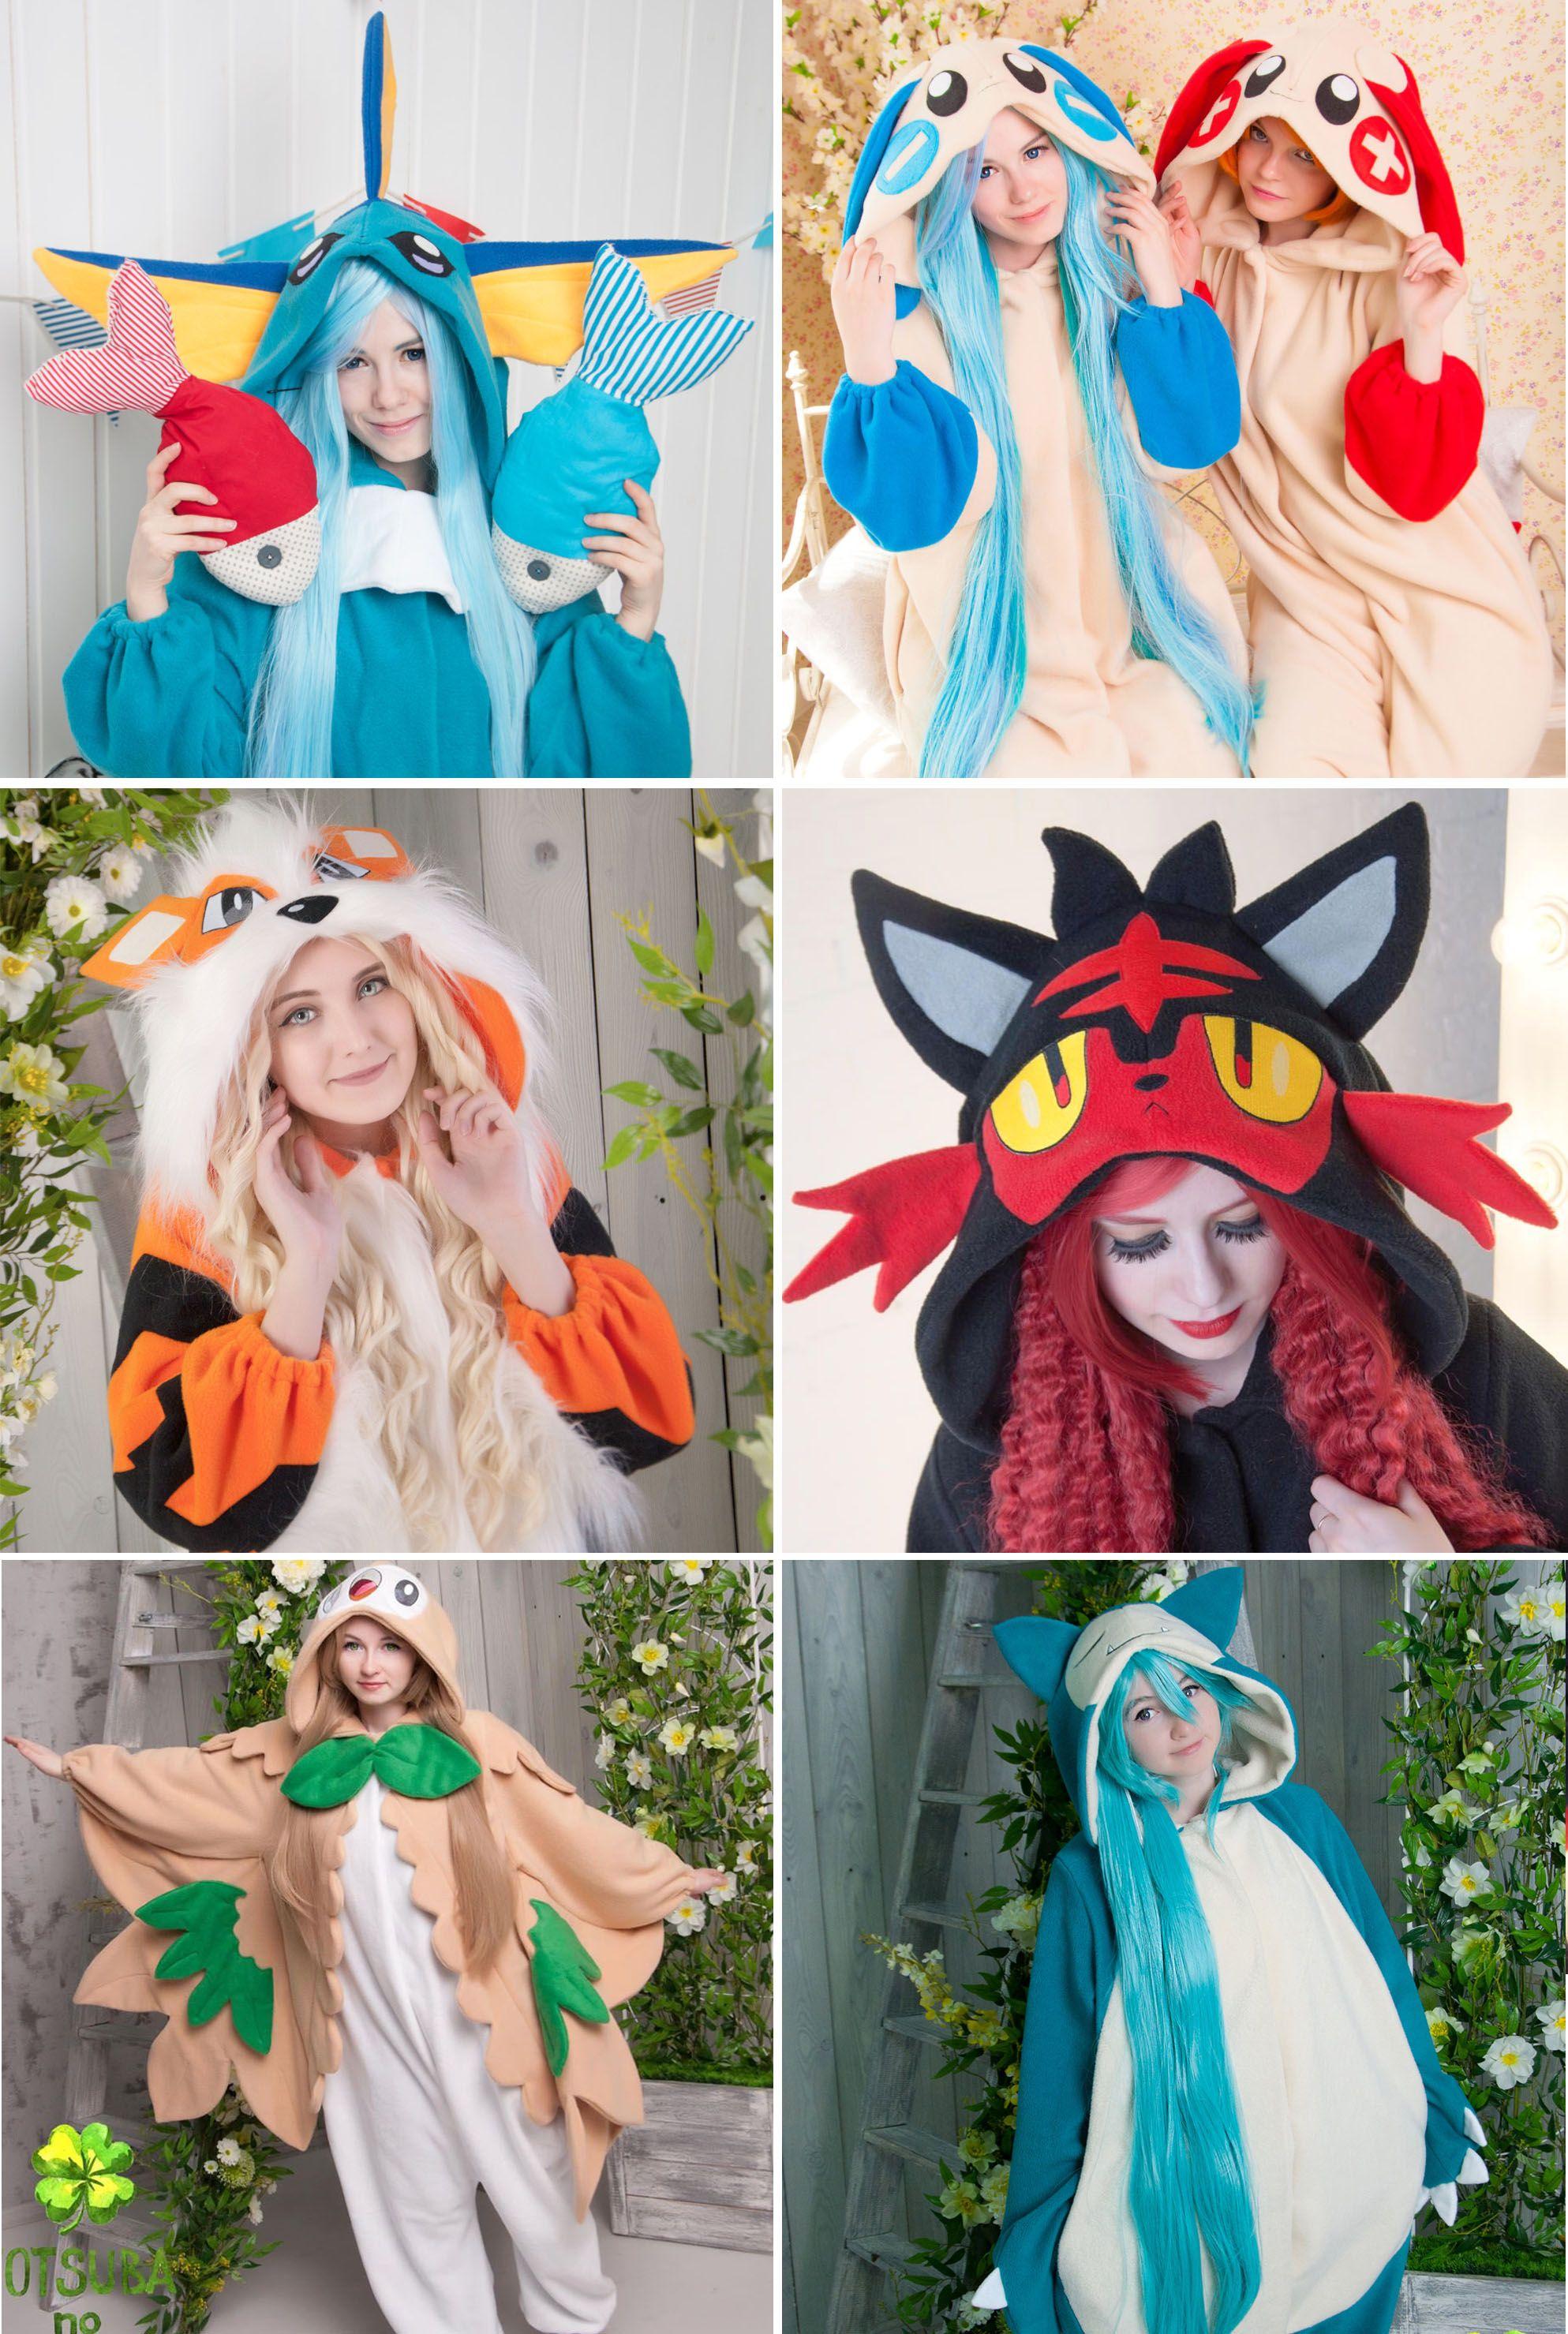 2db5914067b2 Wholesale Panda Stitch Unicorn Unisex Flannel Hoodie Pajamas Costume  Cosplay Animal Onesies Sleepwear For Adul… | Nightgowns, Pajama Sets &  Sleepshirts ...